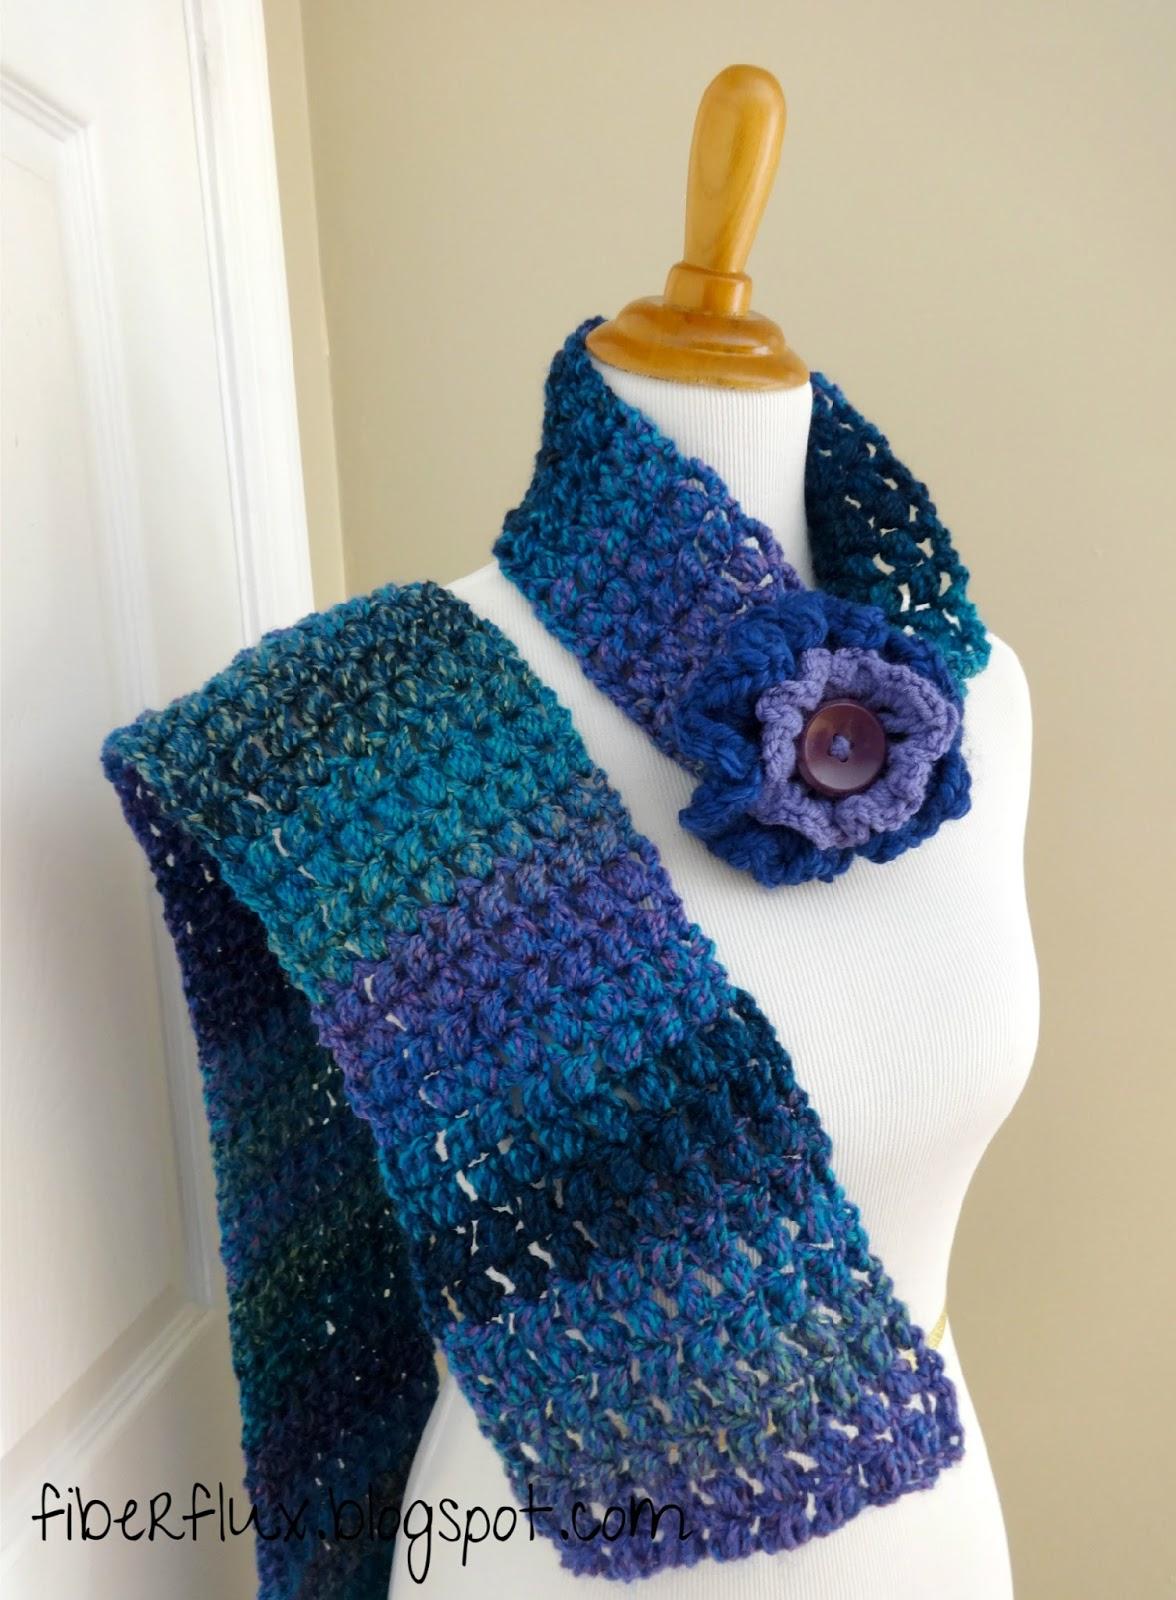 Fiber Flux Free Crochet Pattern Tweedy Puff Stitch Ear